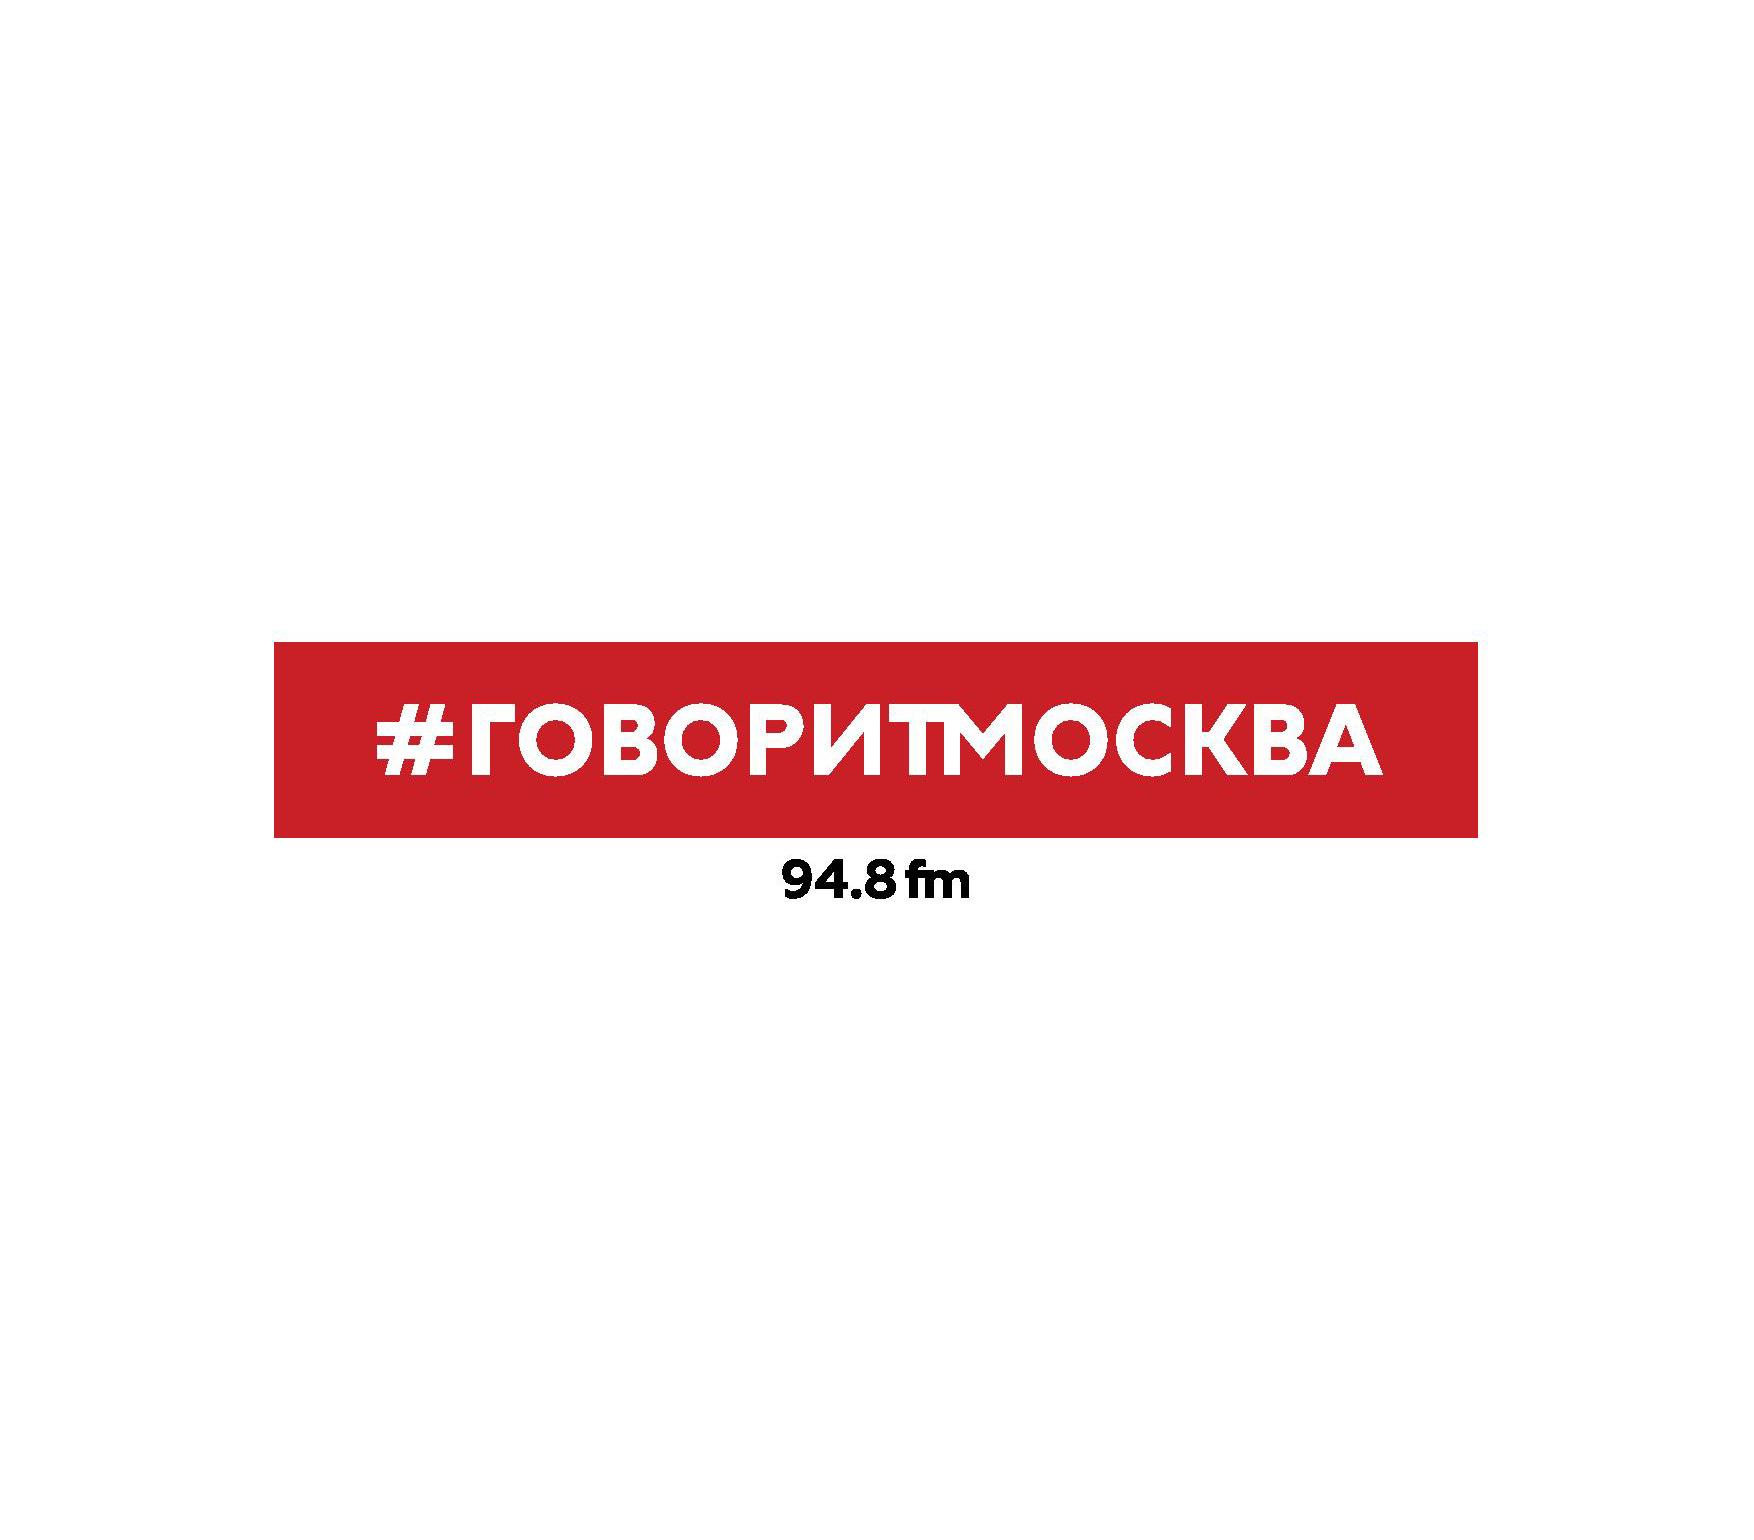 Макс Челноков 11 марта. Виталий Третьяков